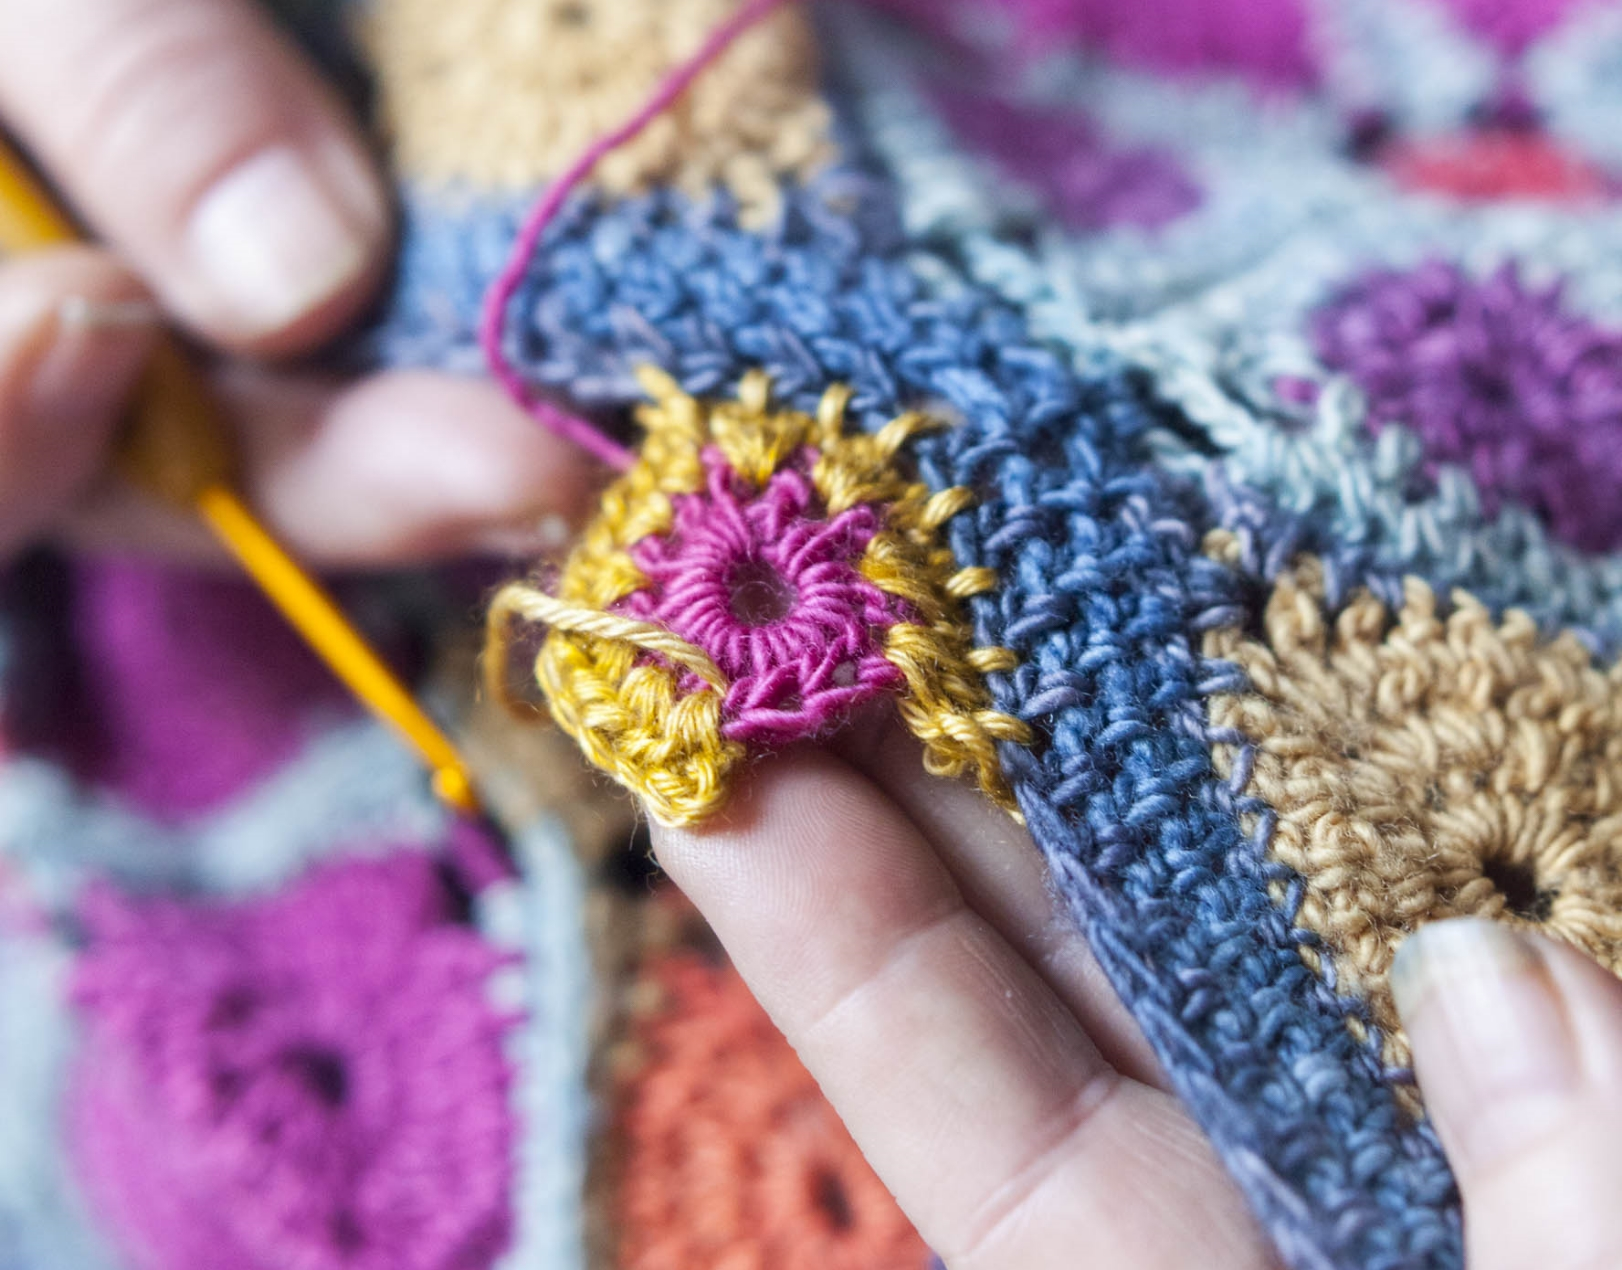 094_Crochet.jpg